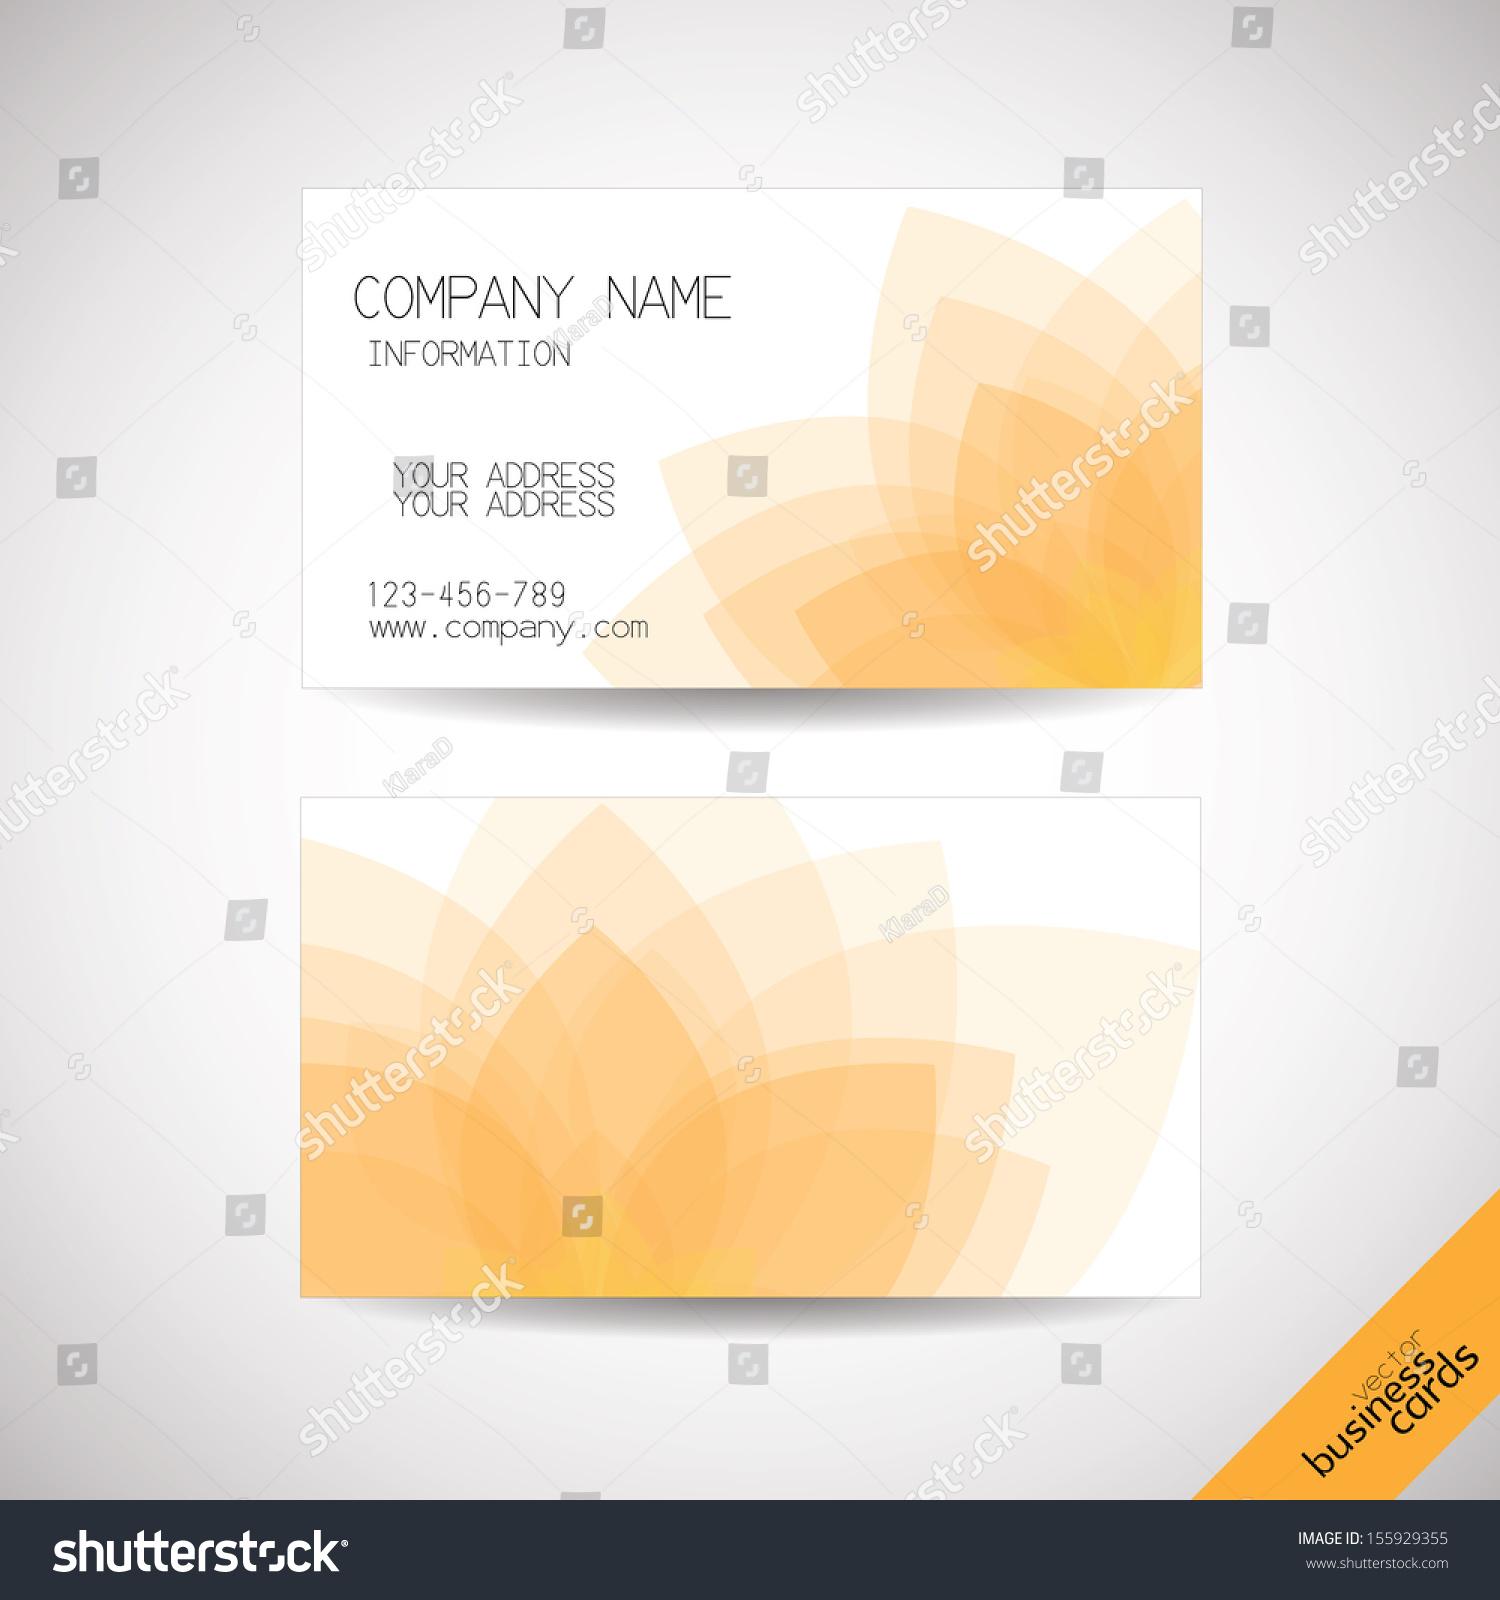 Best Lotus Business Cards Photos - Business Card Ideas - etadam.info